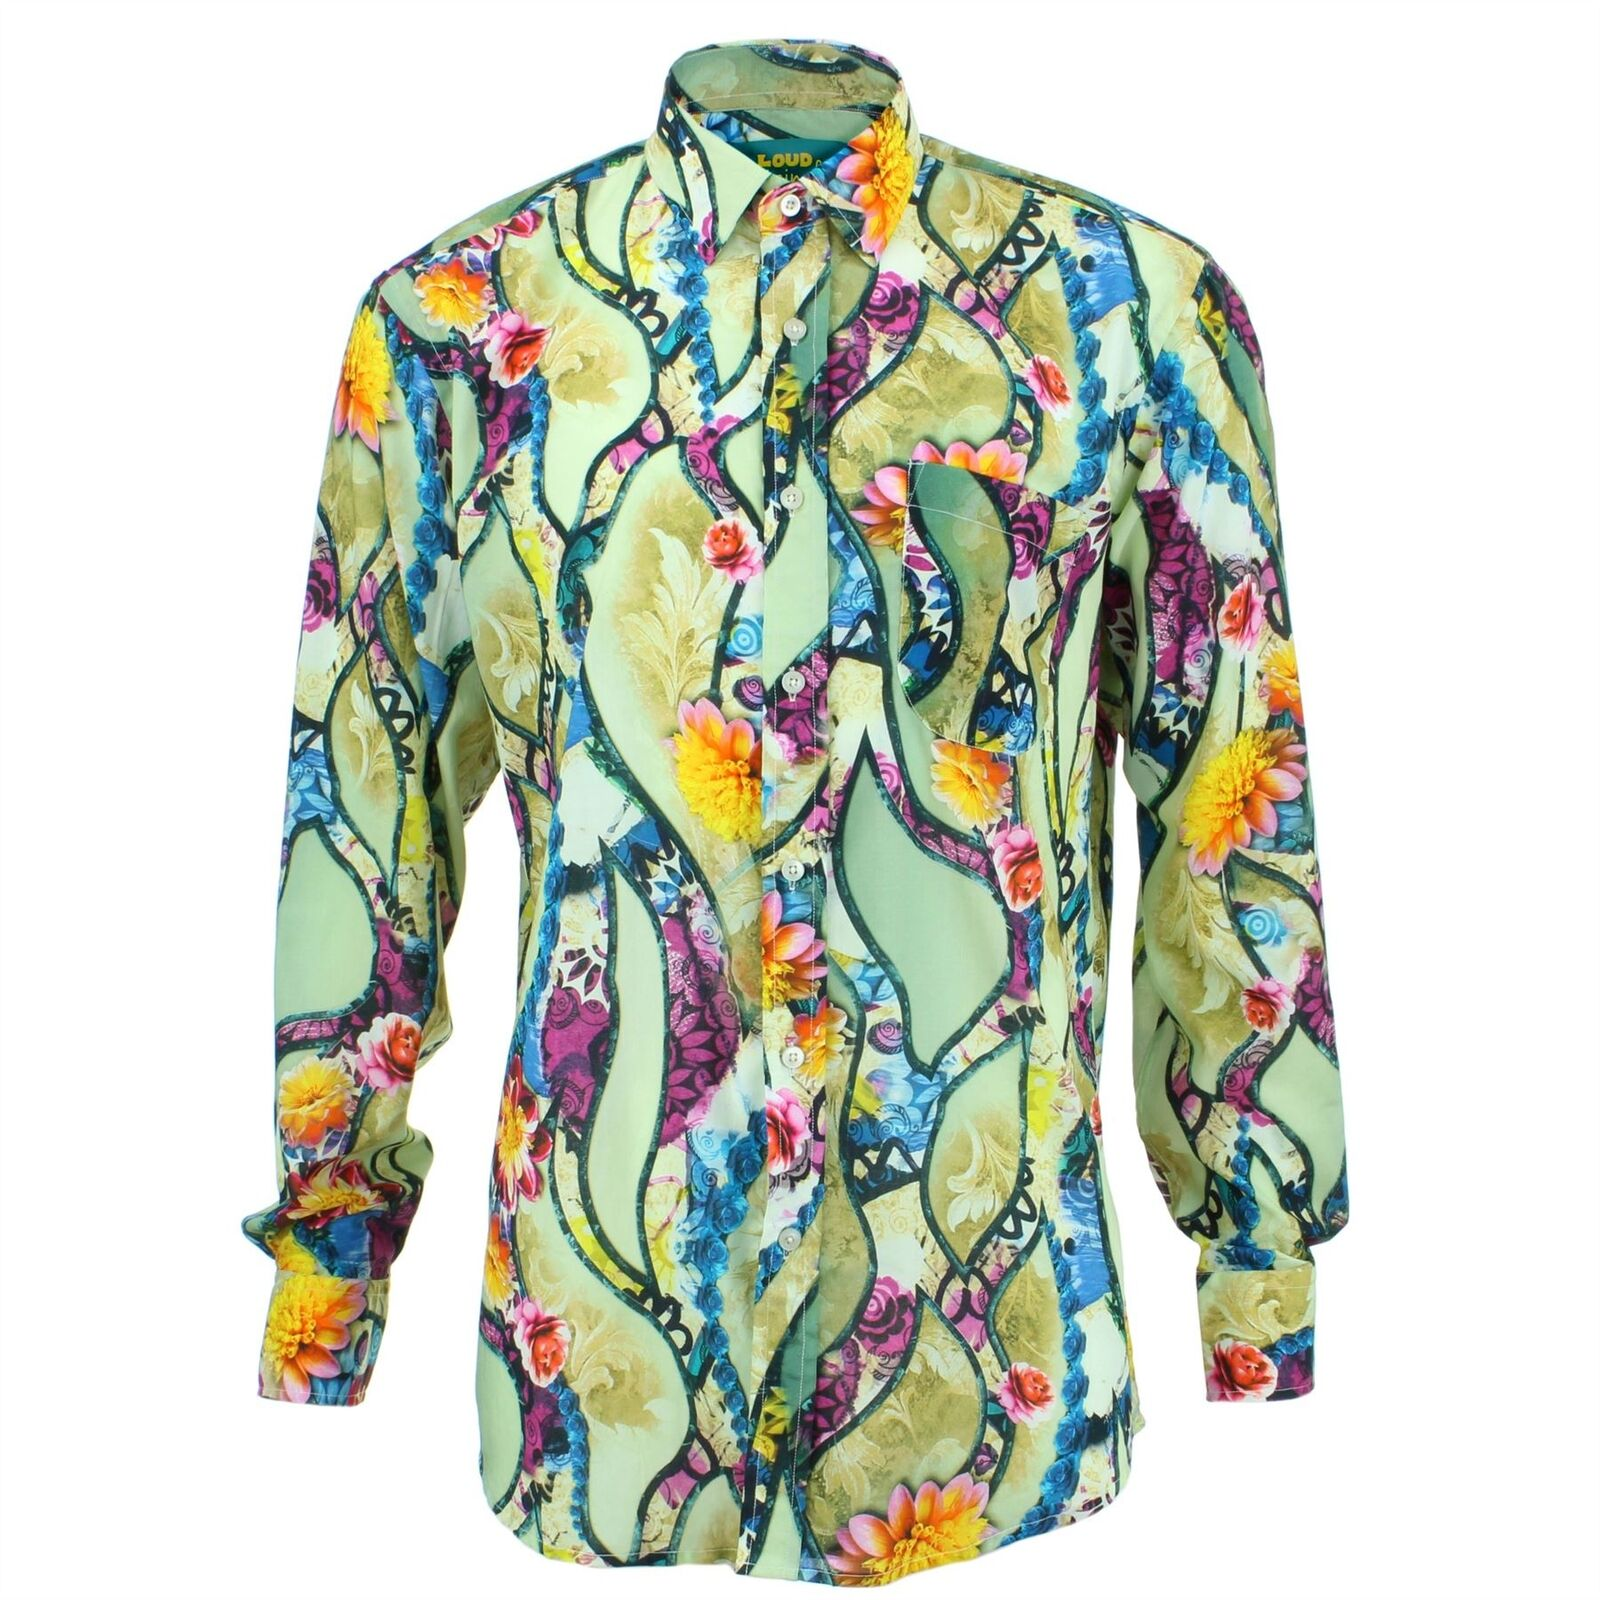 abbf3b08 Men's Loud Shirt REGULAR Purple Retro Psychedelic Fancy Floral FIT ...